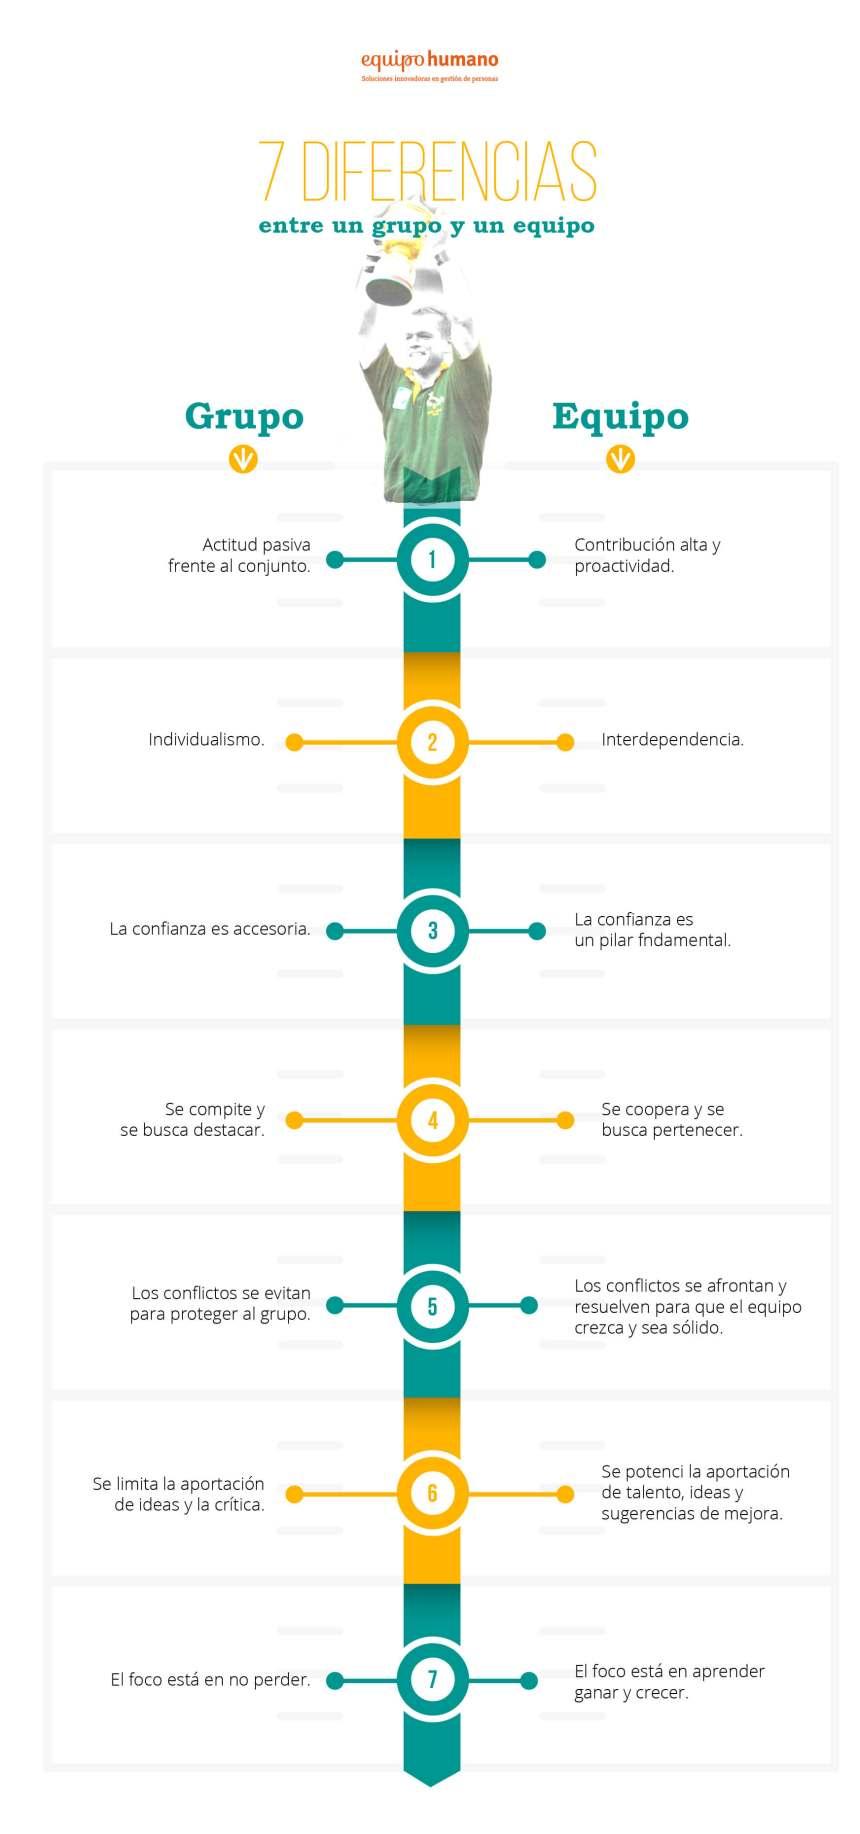 7 diferencias entre un grupo y un equipo #infografia #infographic #rrhh